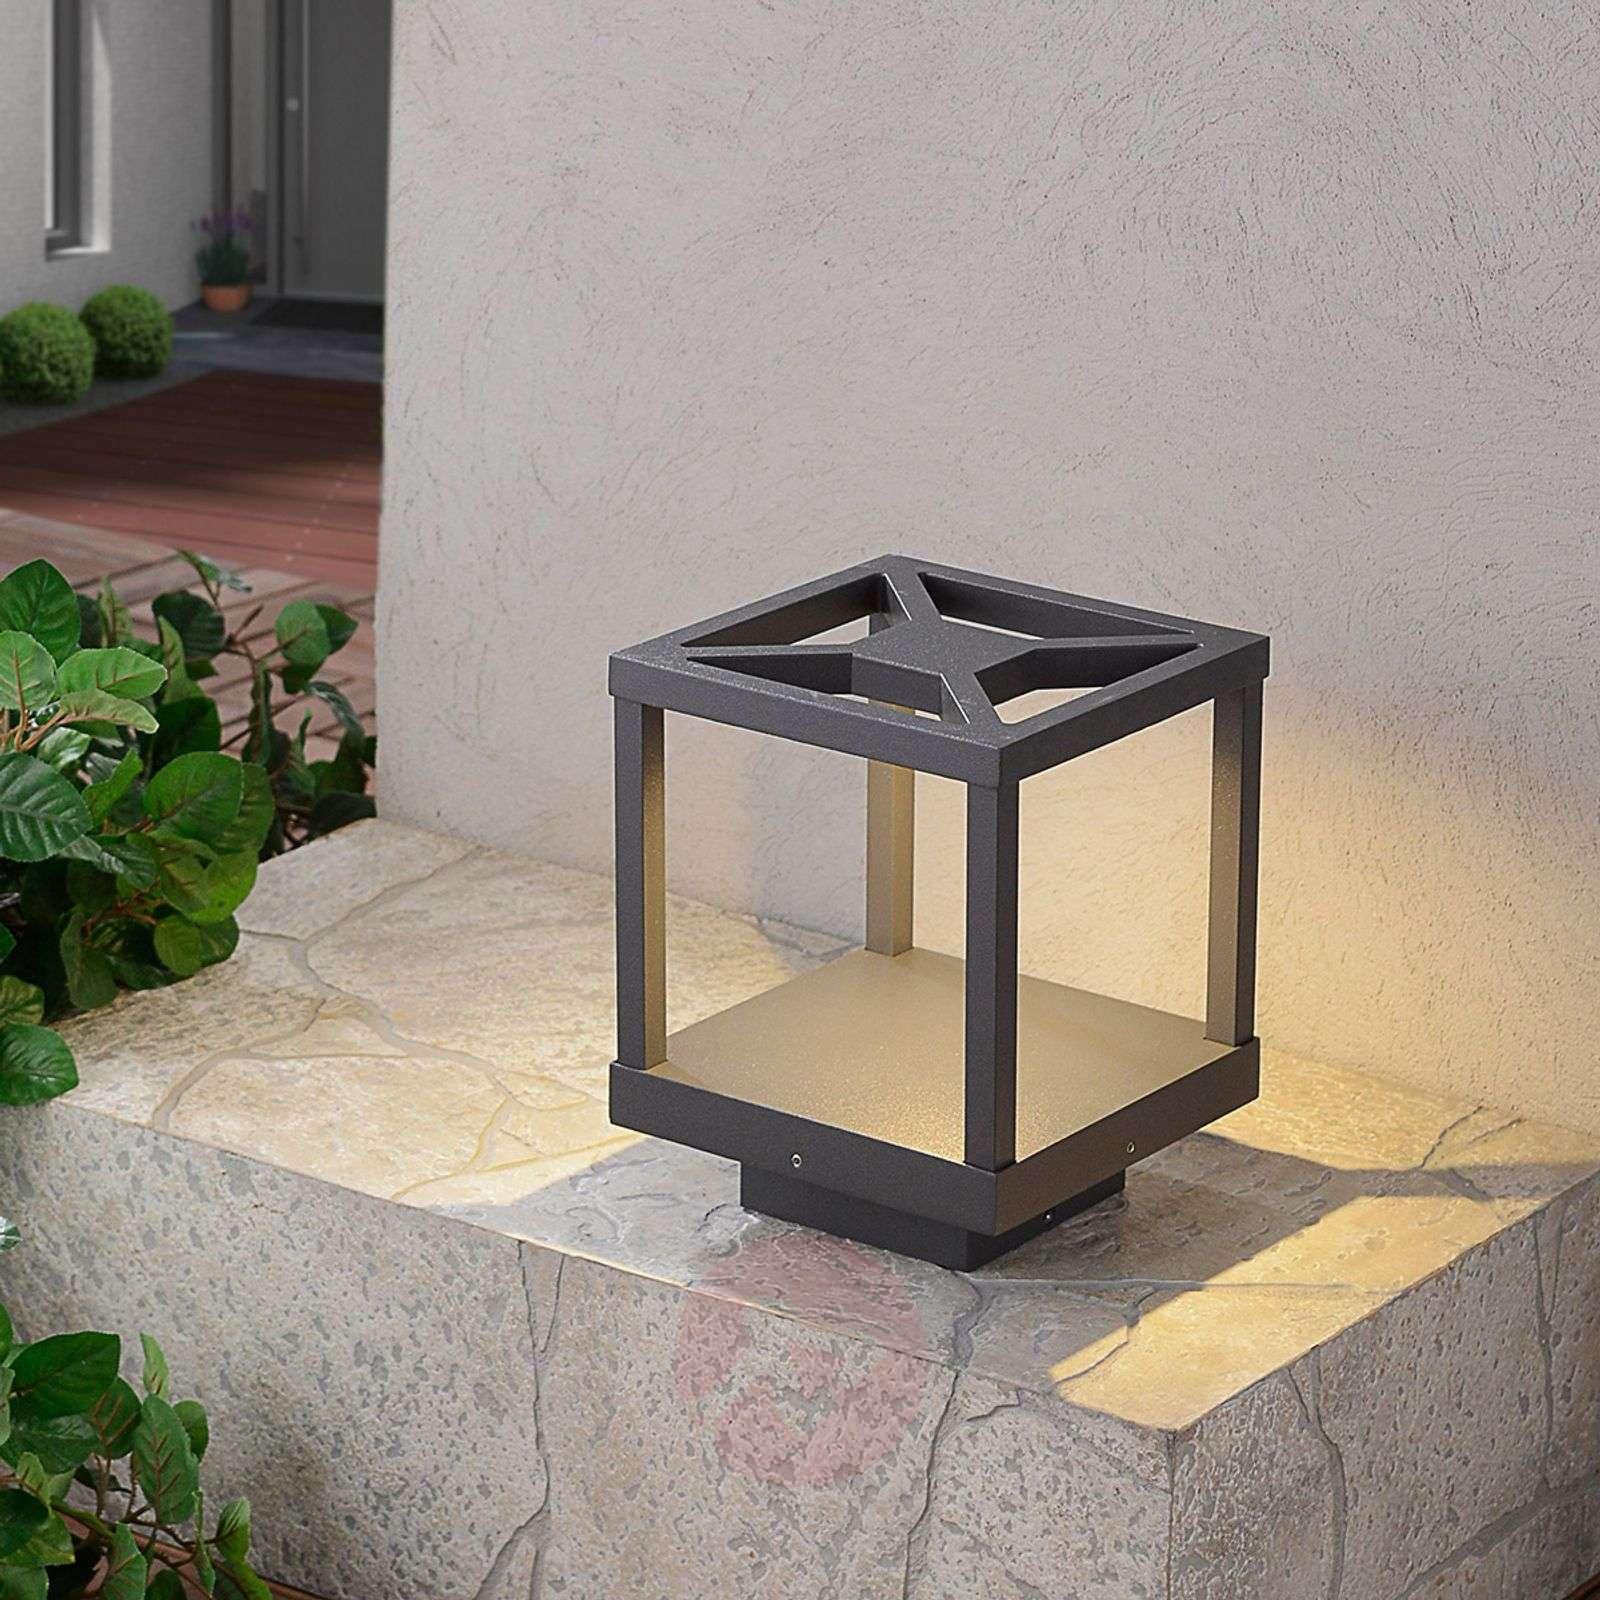 Extravagant LED pillar light Lealand-9618058-01